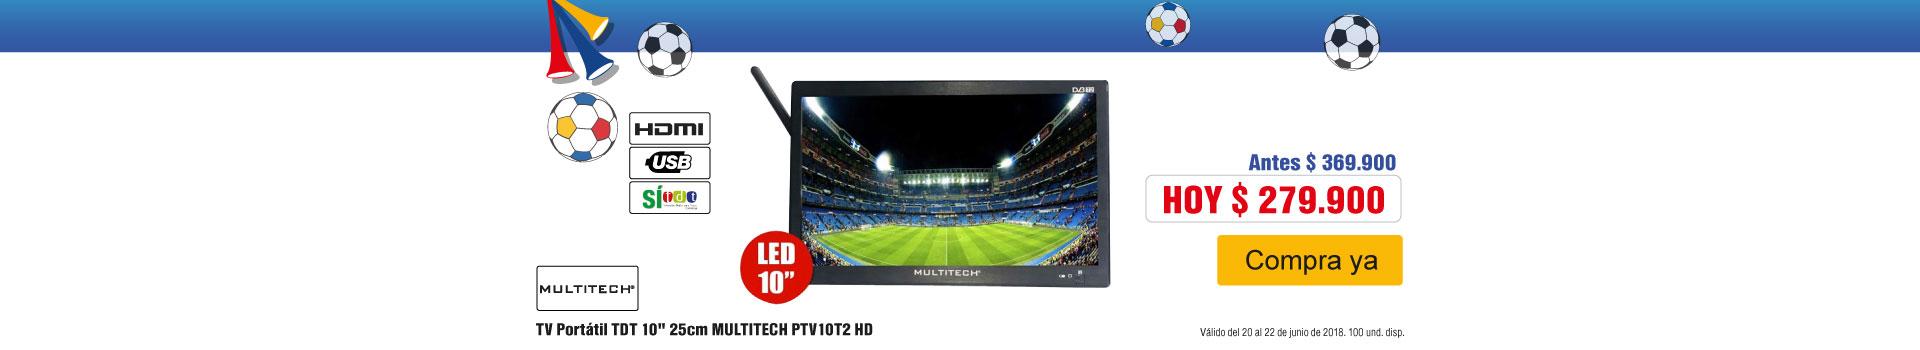 AK-KT-BCAT-1-TV-MULTITECH-PTV10T2-junio-20